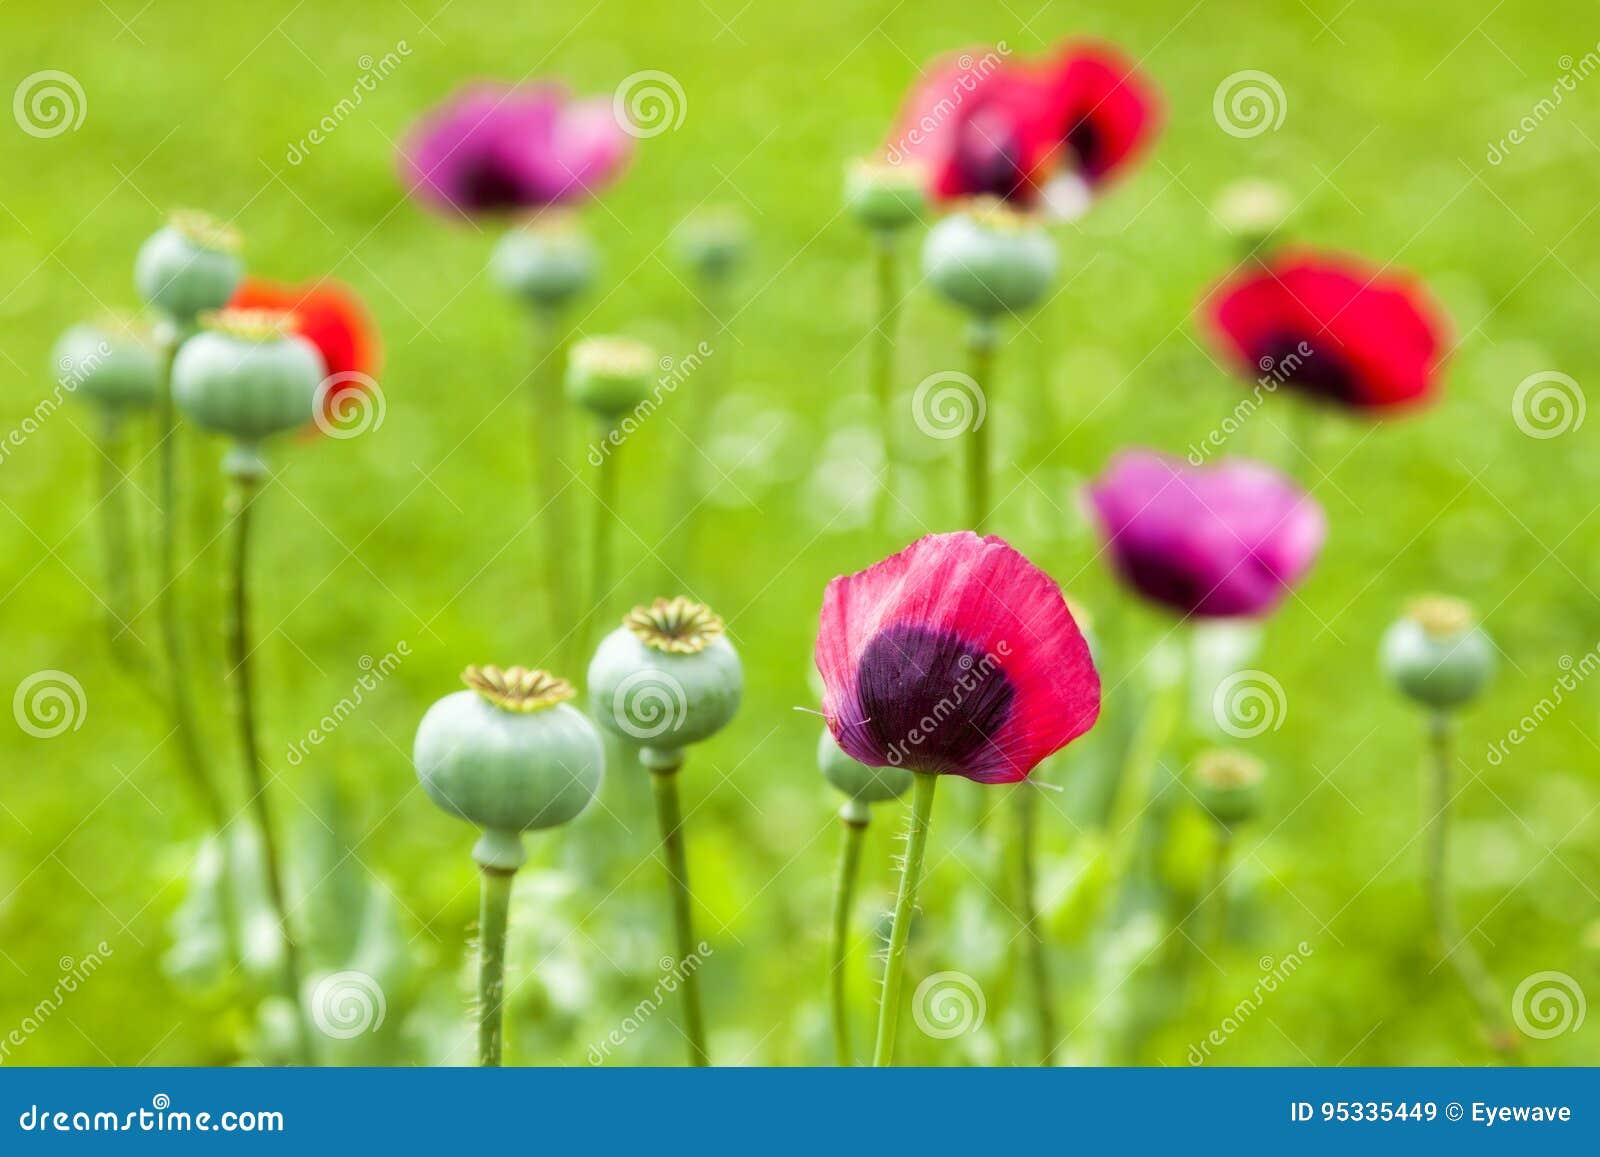 Vibrant poppy flower on meadow stock image image of meadow focus vibrant poppy flower on meadow mightylinksfo